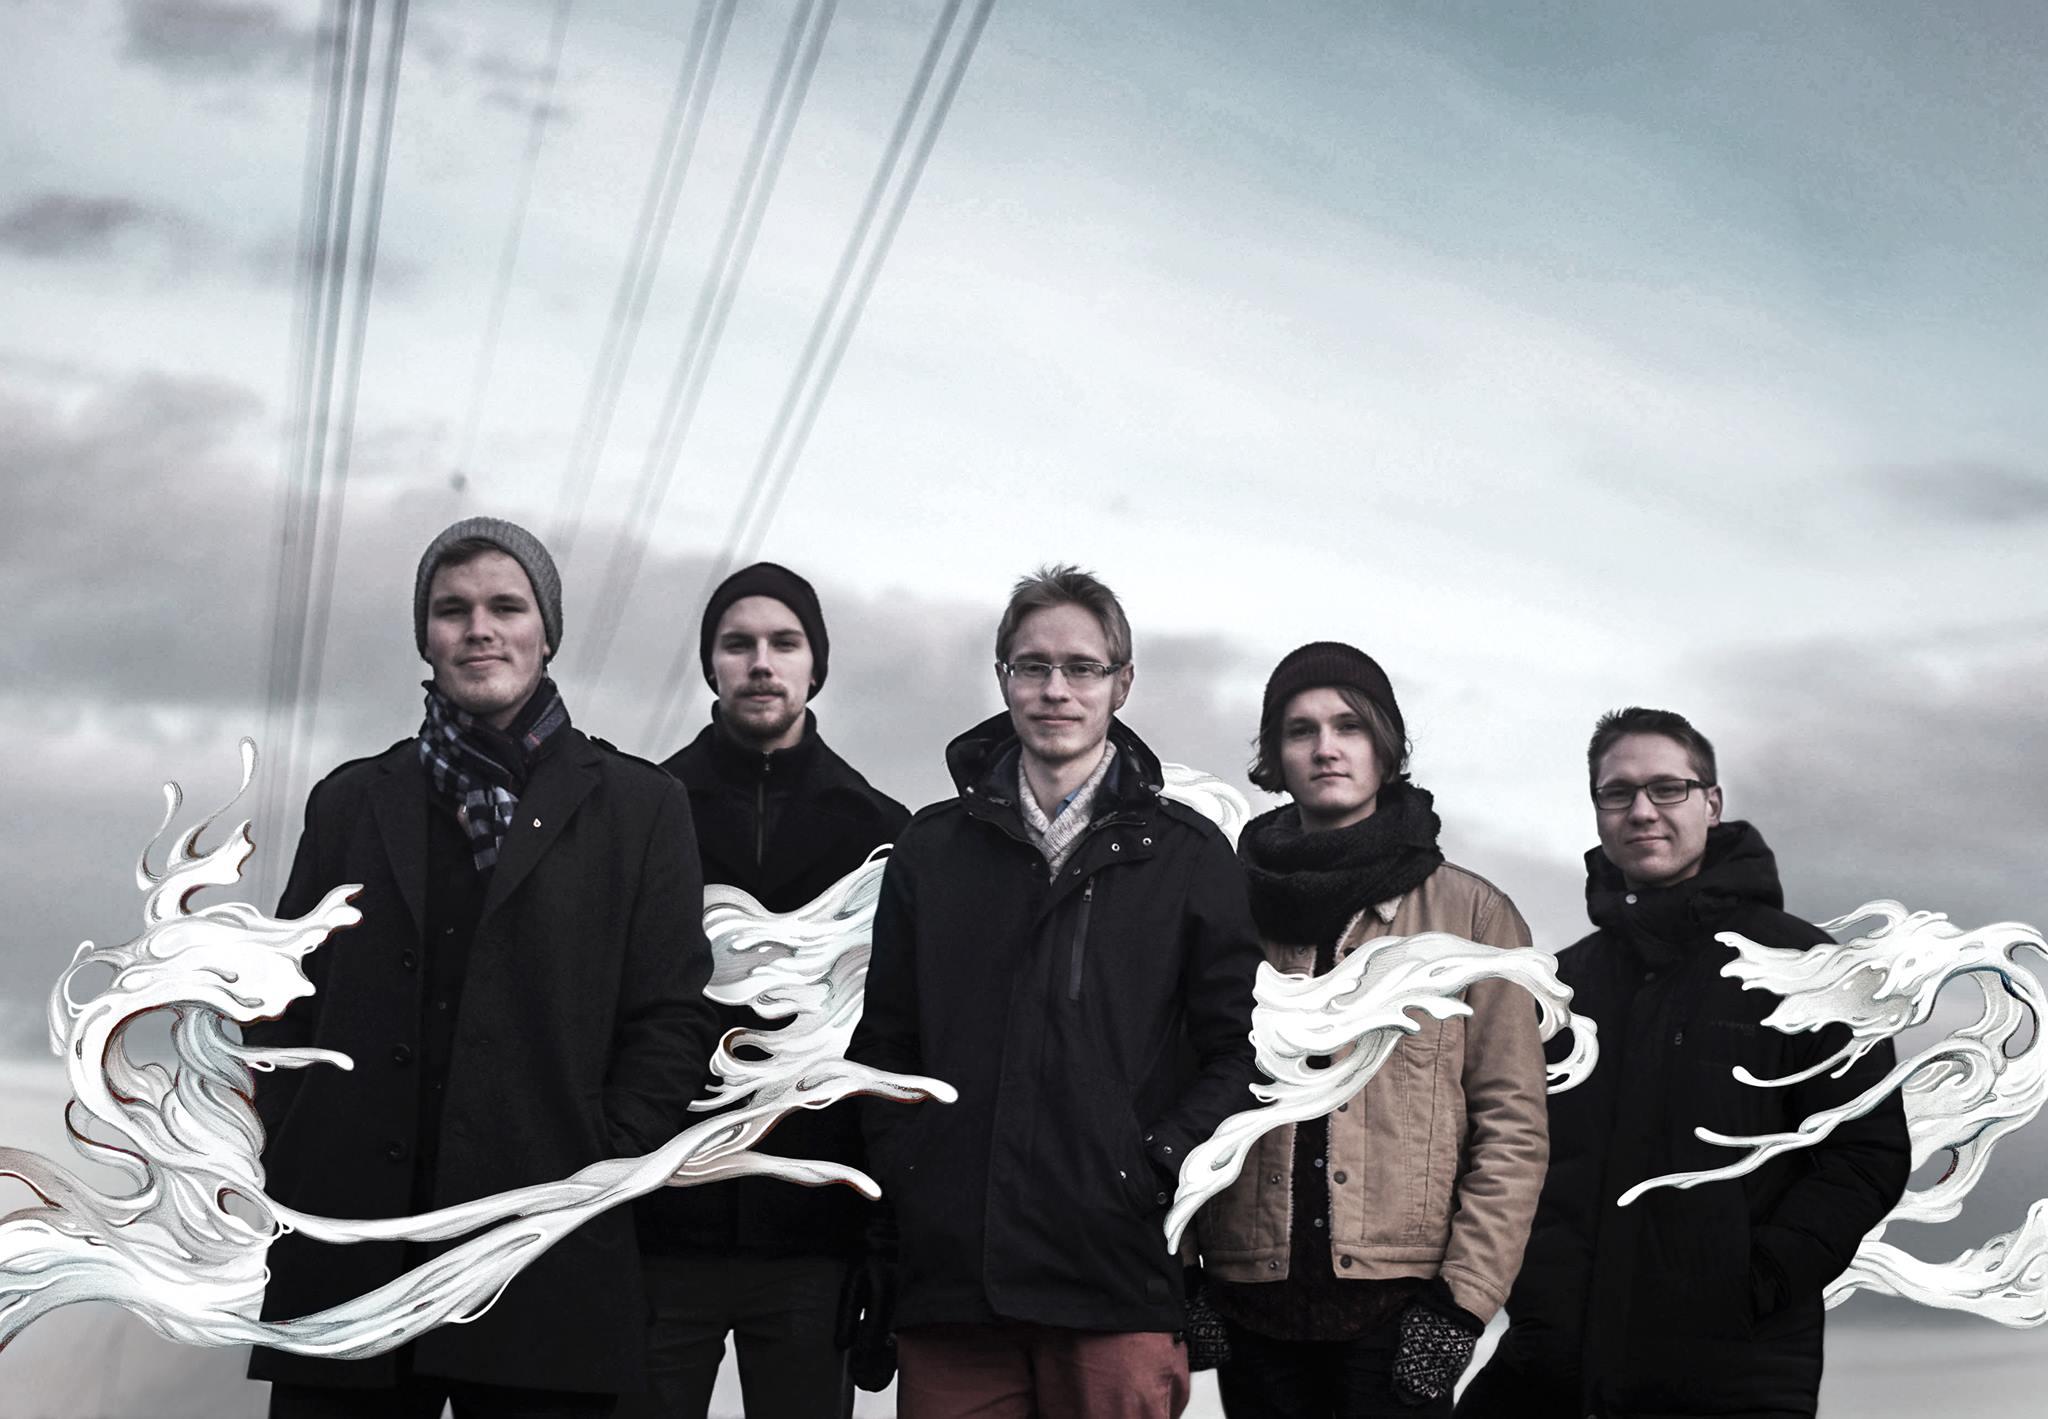 Ke 26.2. Rytmihäiriöklubi: Second Wind Quintet Klo 21.00